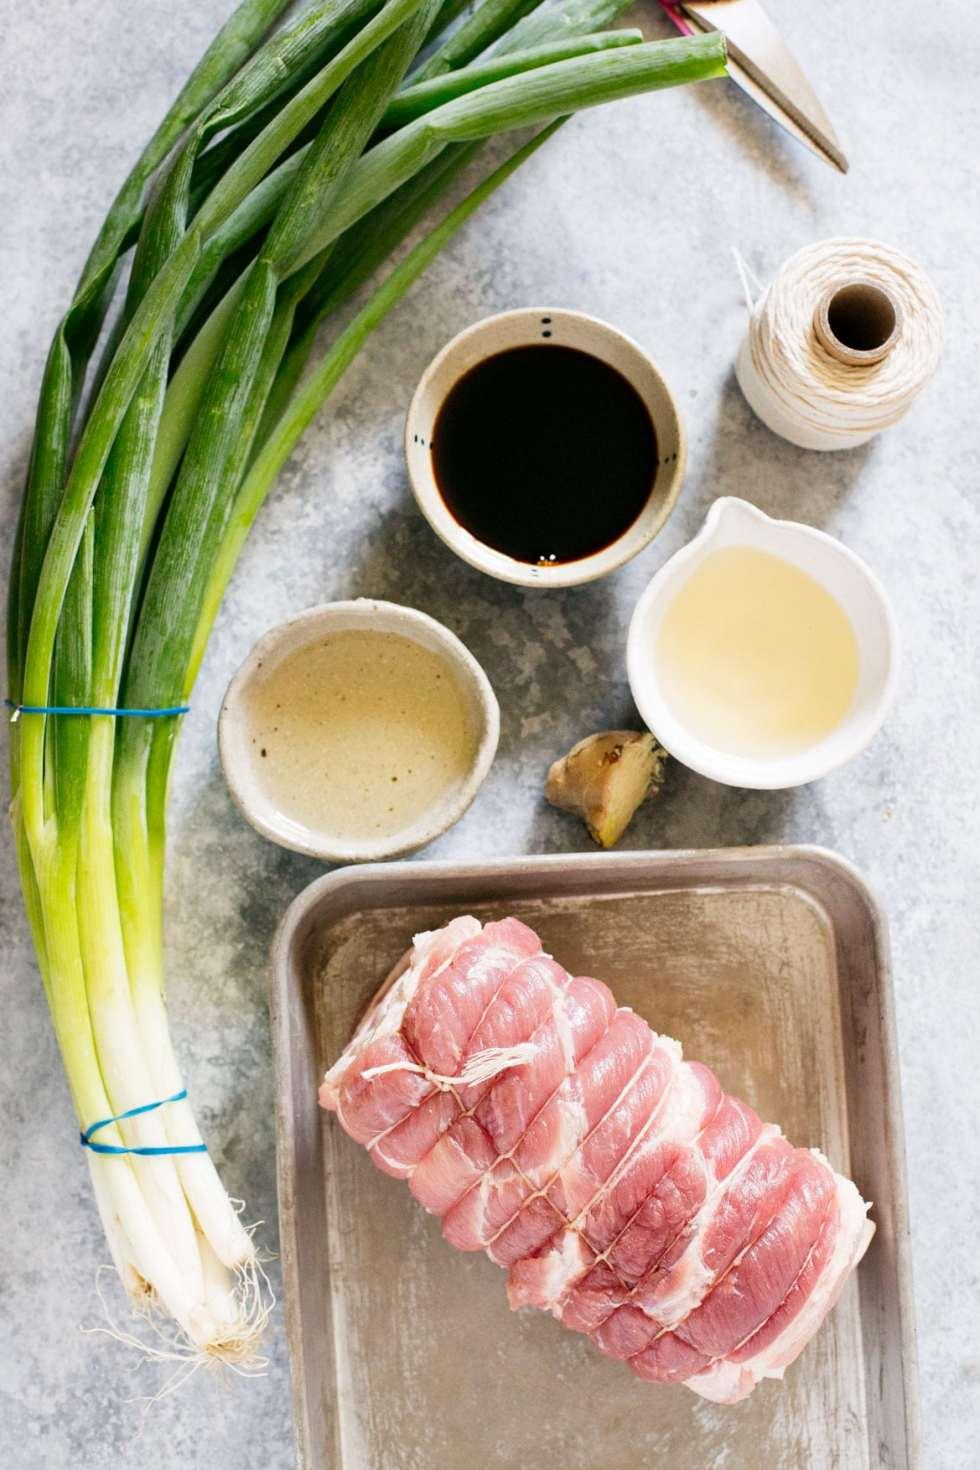 ingredients of the ramen pork Chashu